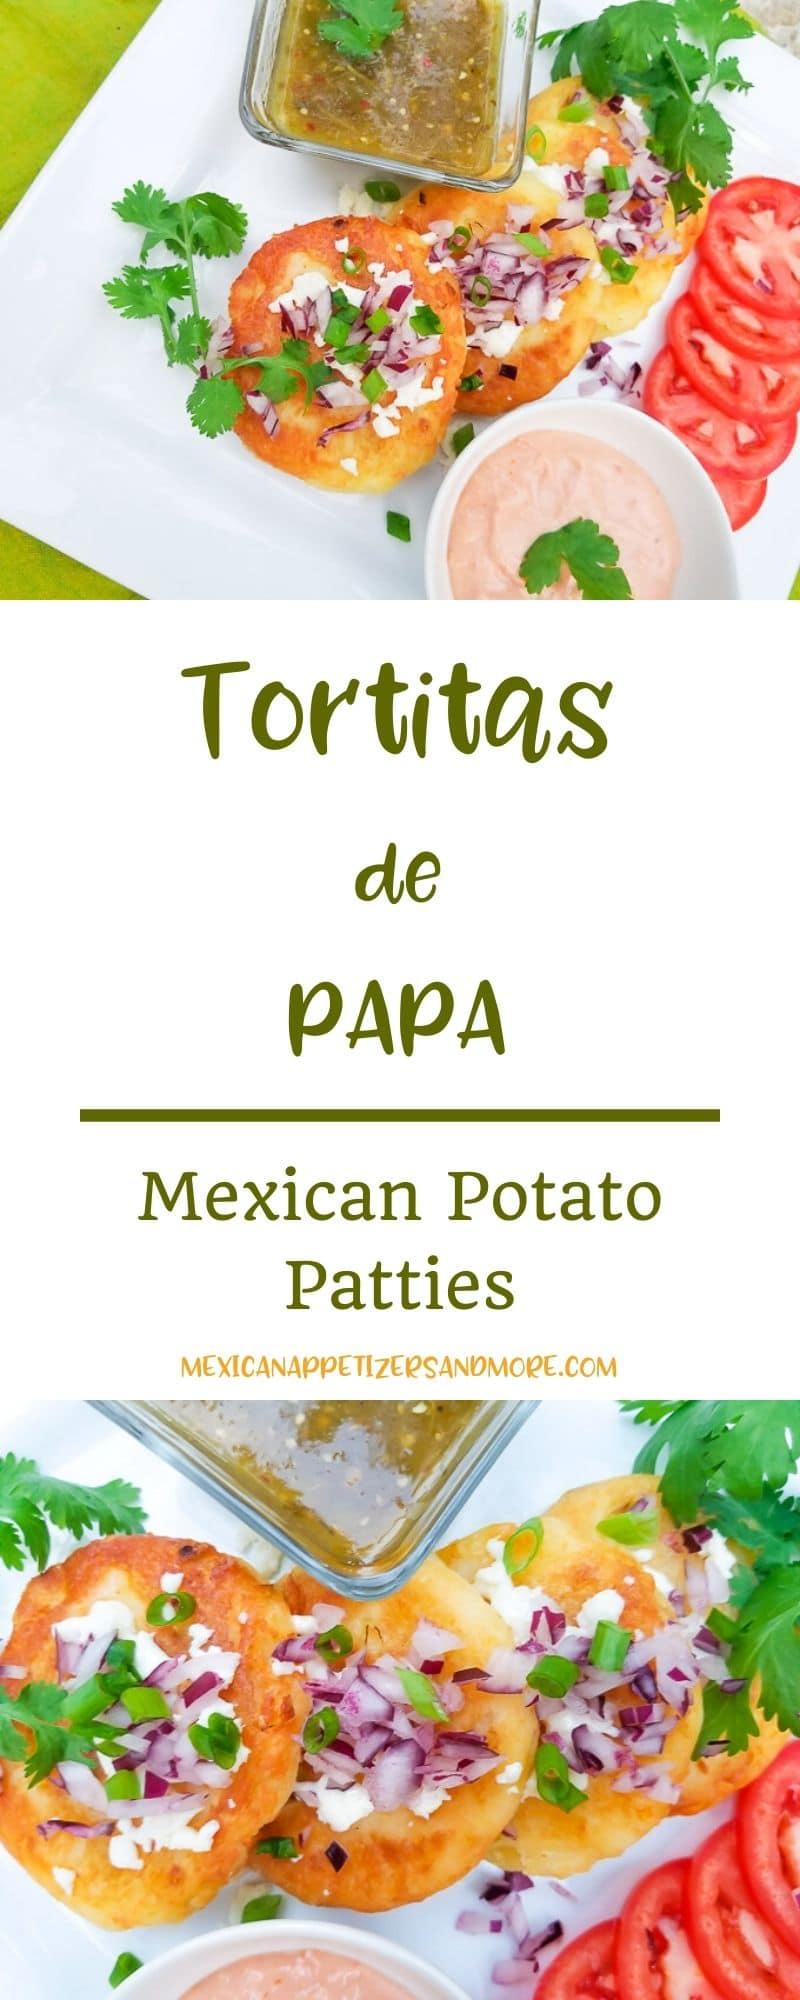 Tortitas de Papa (Potato Fritters)